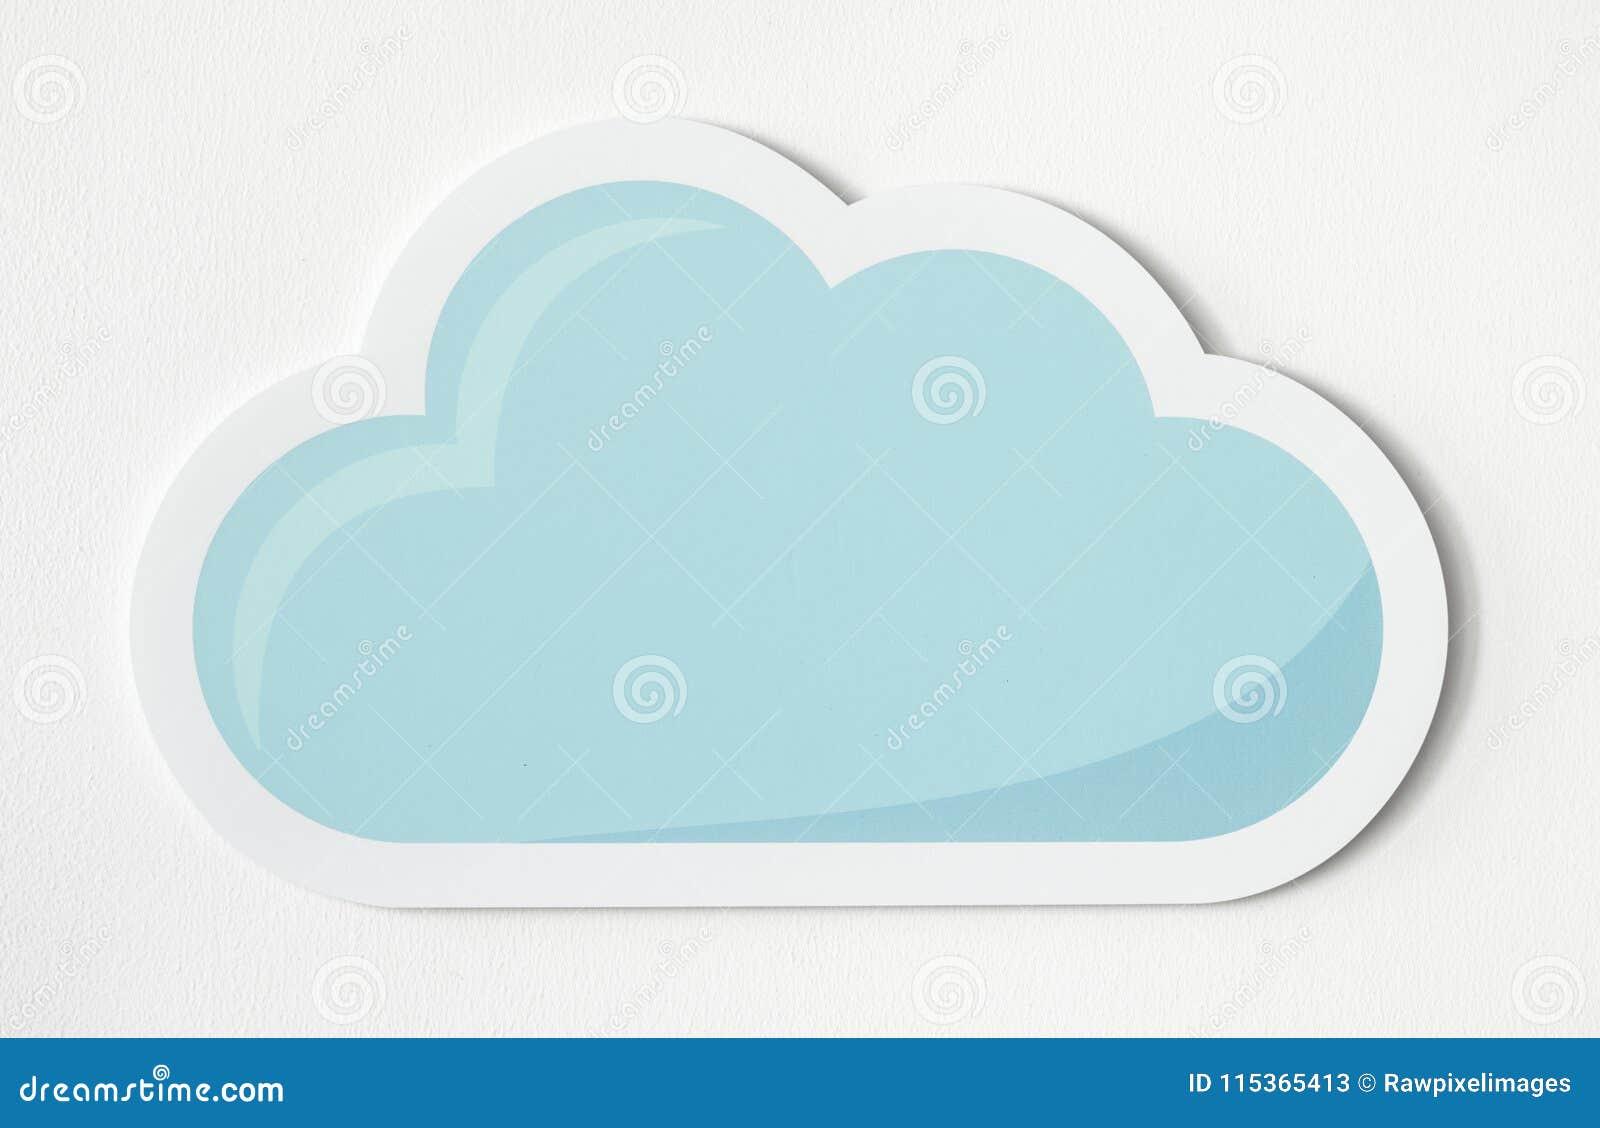 photo regarding Printable Clouds Cut Out known as cloud slash out -